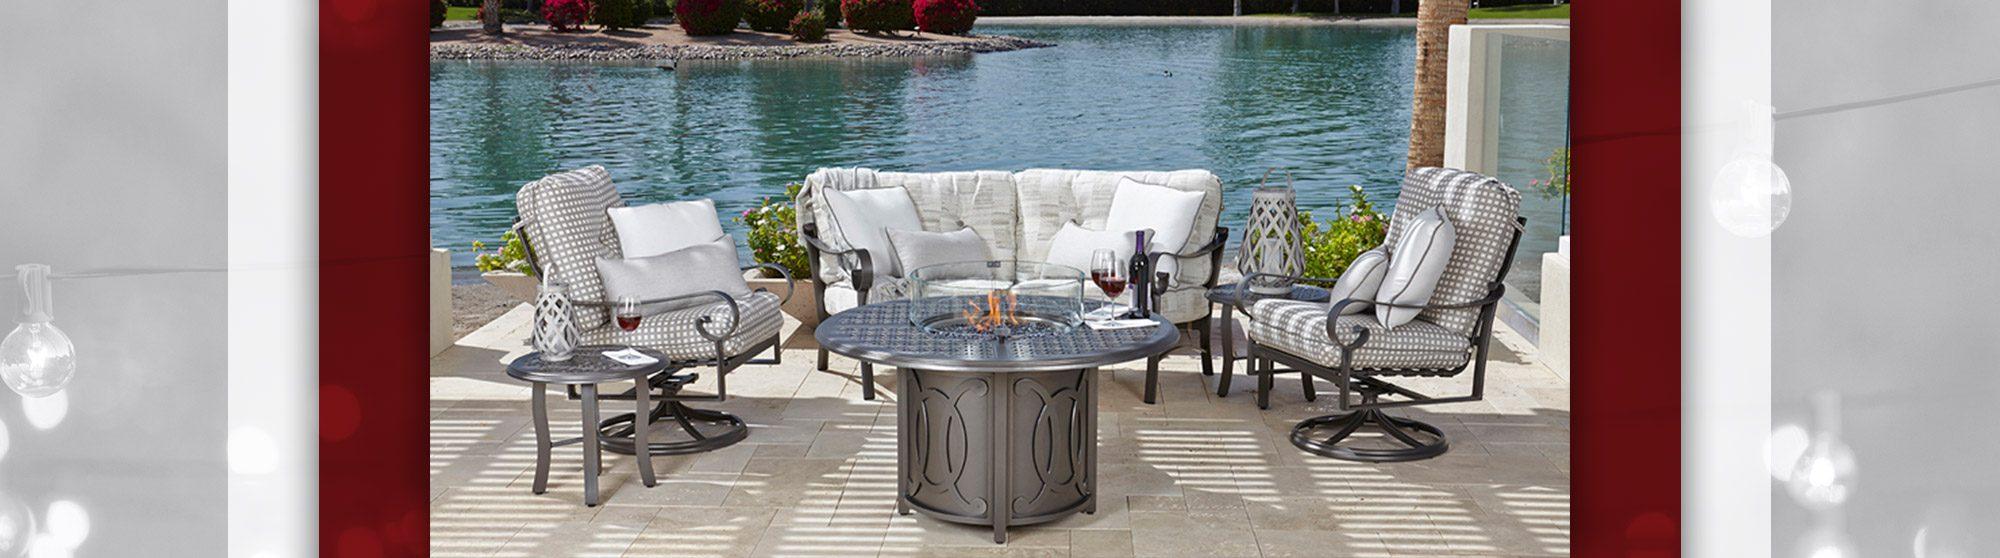 wrought iron patio furniture ga